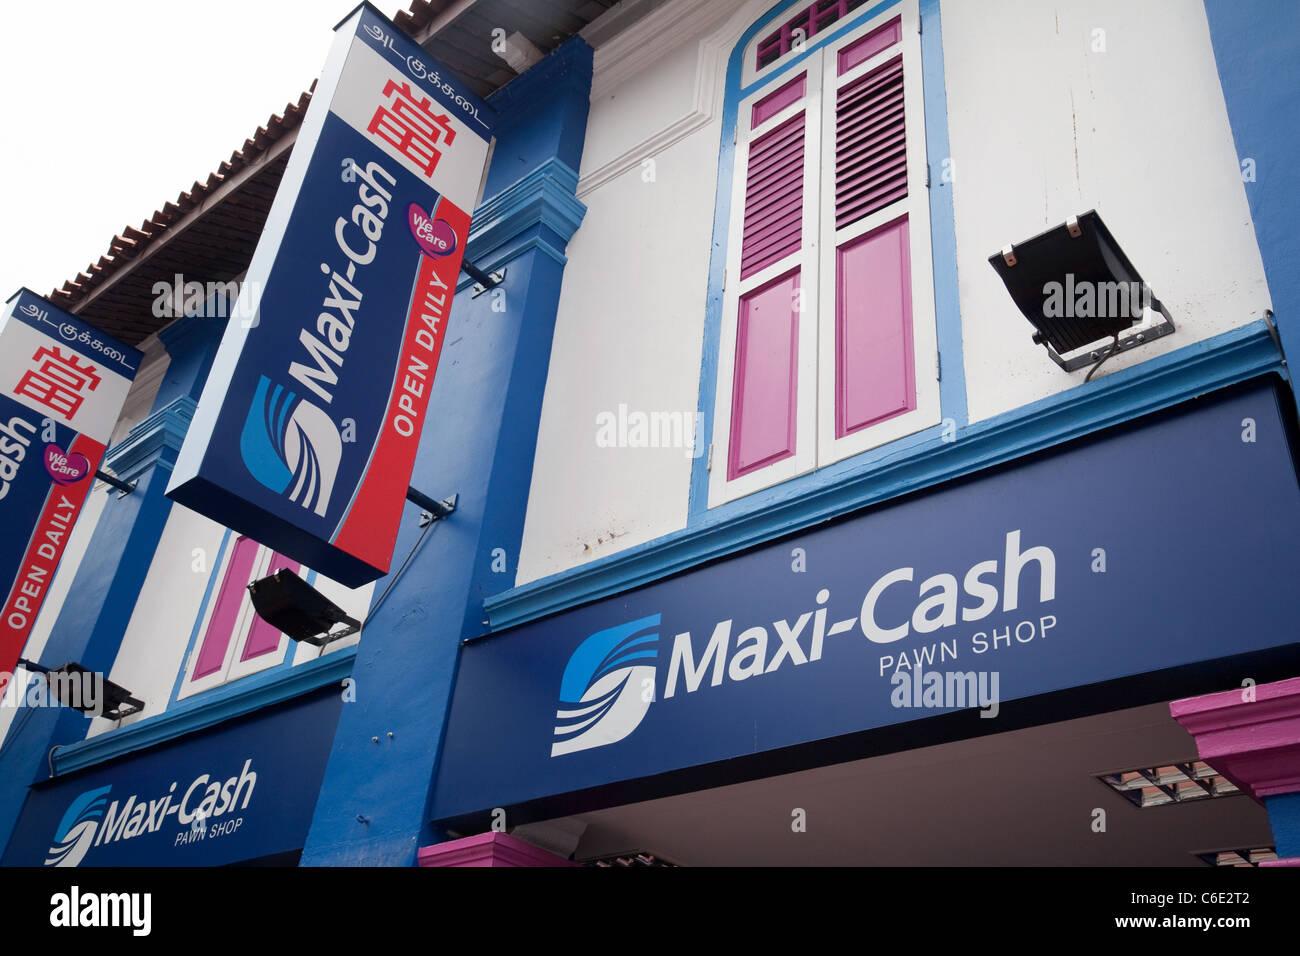 A Maxi-cash pawn shop, Little India, Singapore Asia - Stock Image